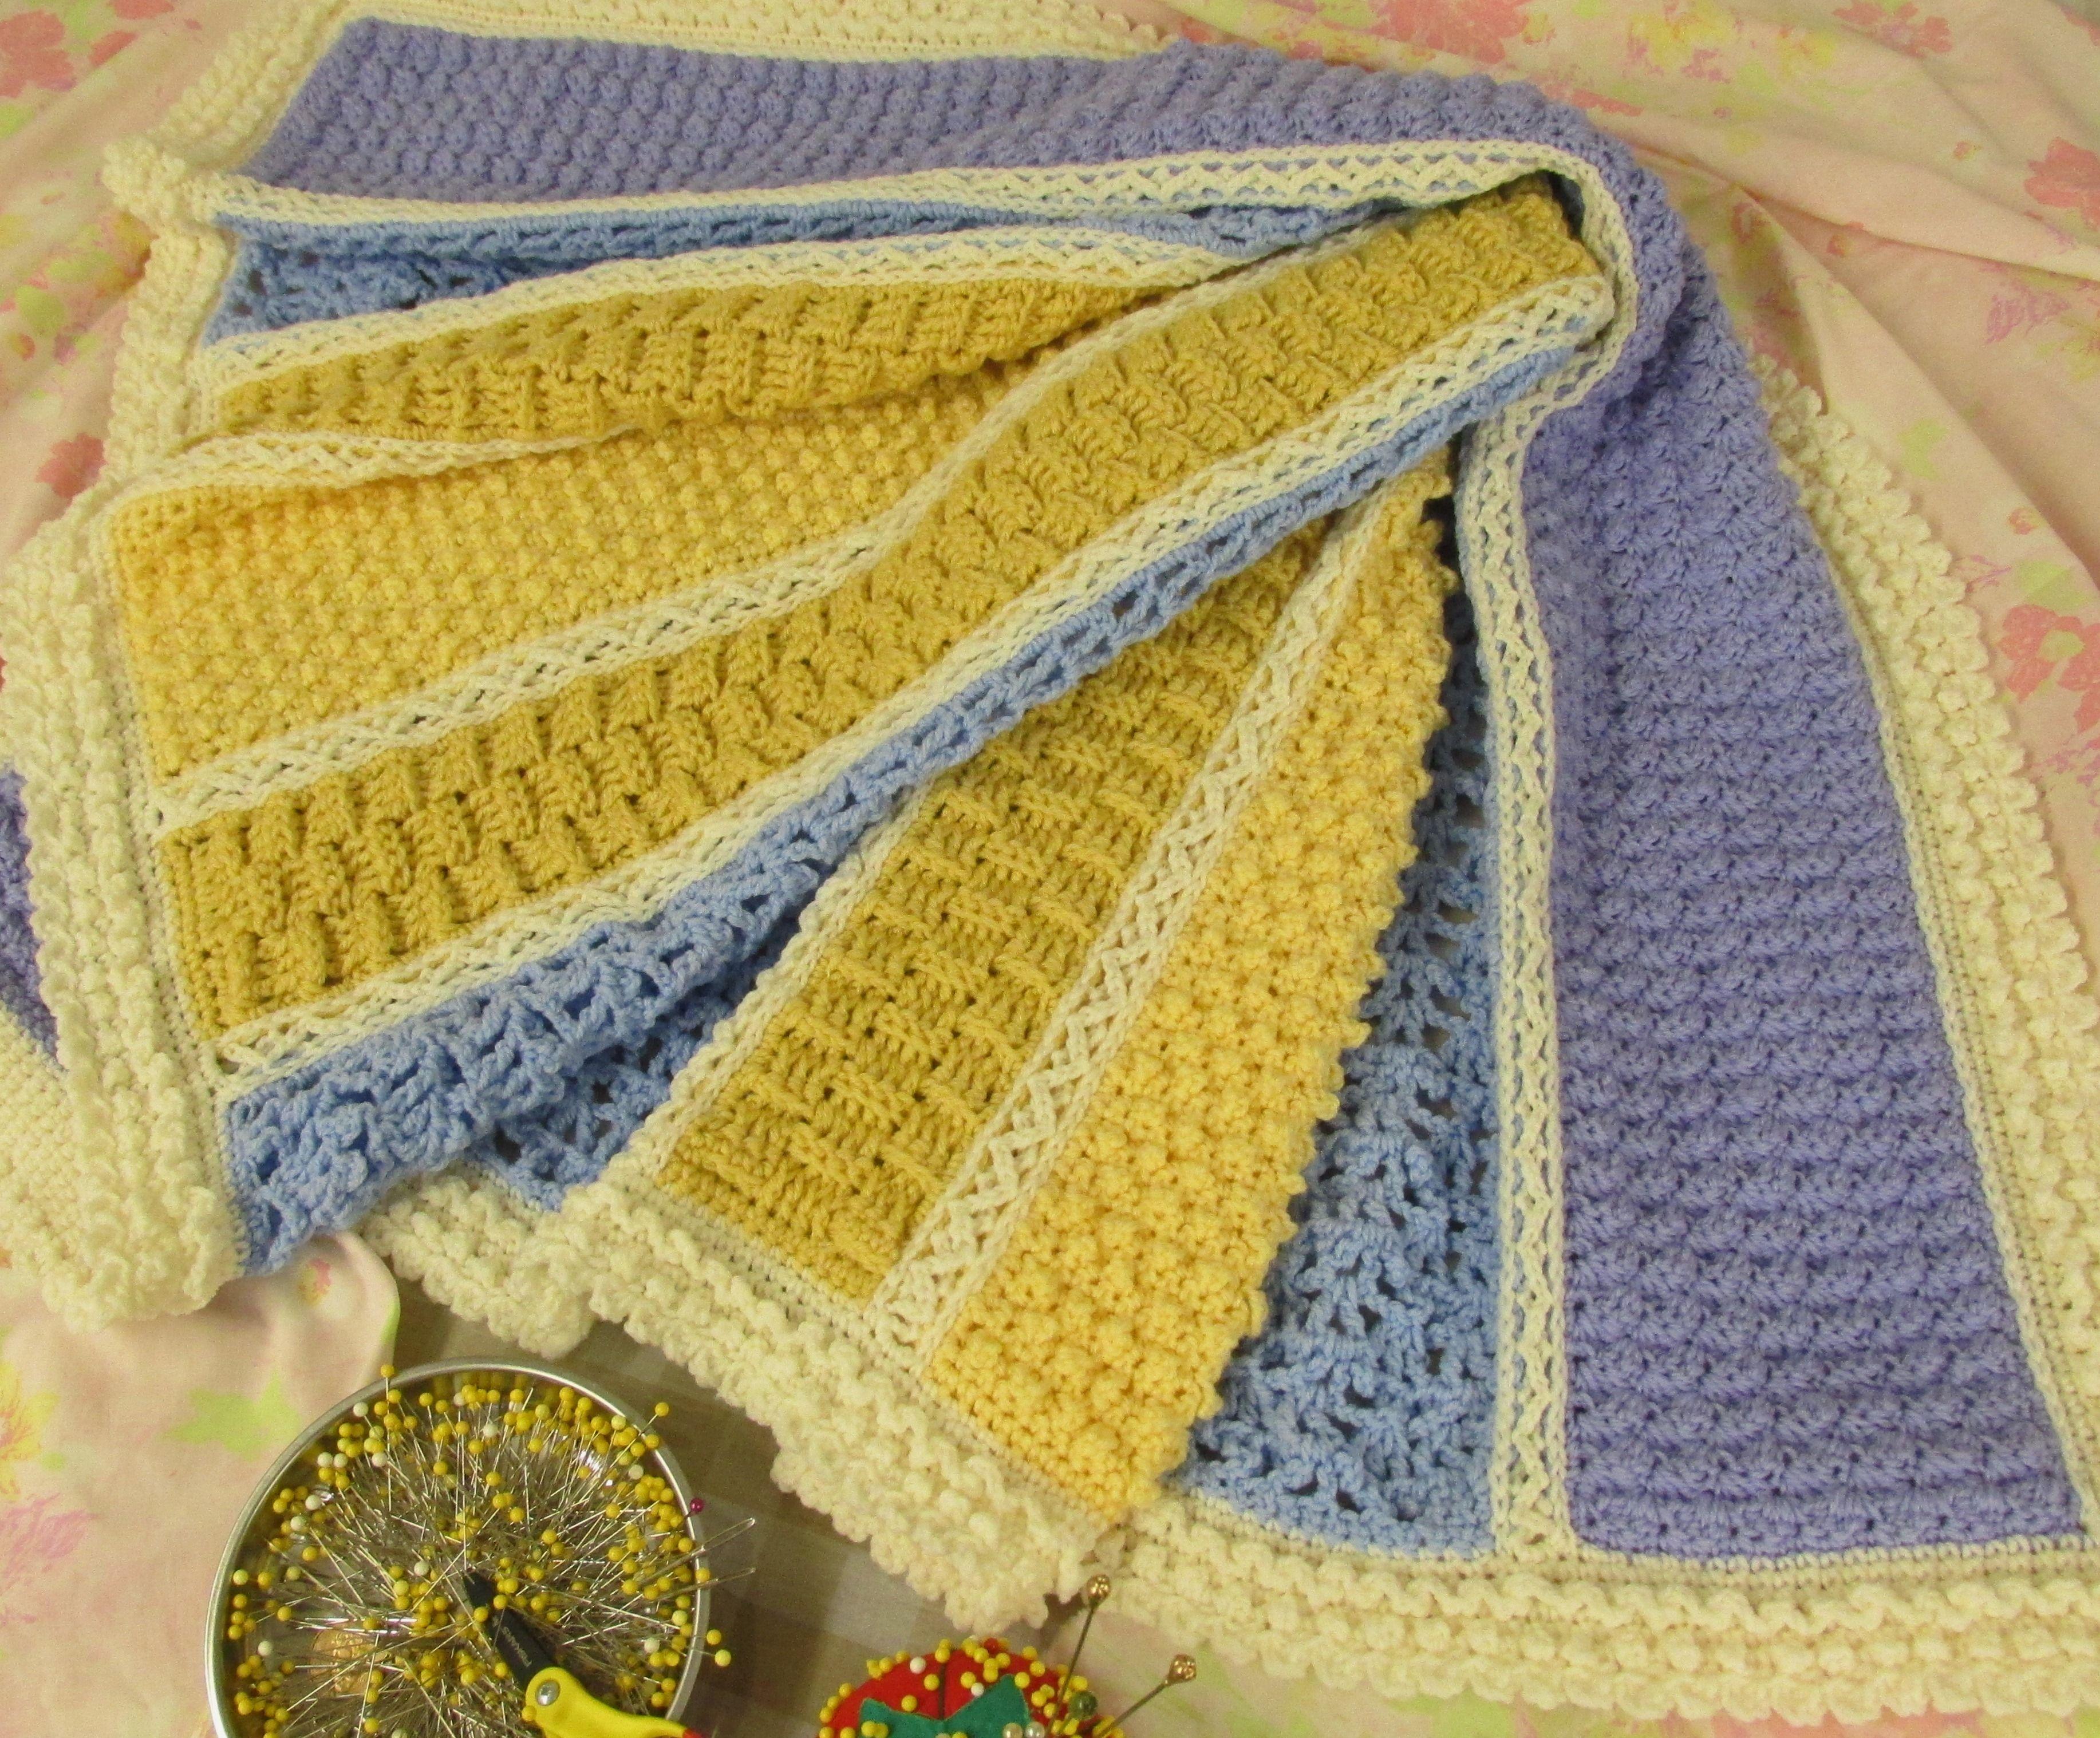 Naomi rose crochet afghan pattern at skerinknittingandcrochet naomi rose crochet afghan pattern at skerinknittingandcrochet dt1010fo